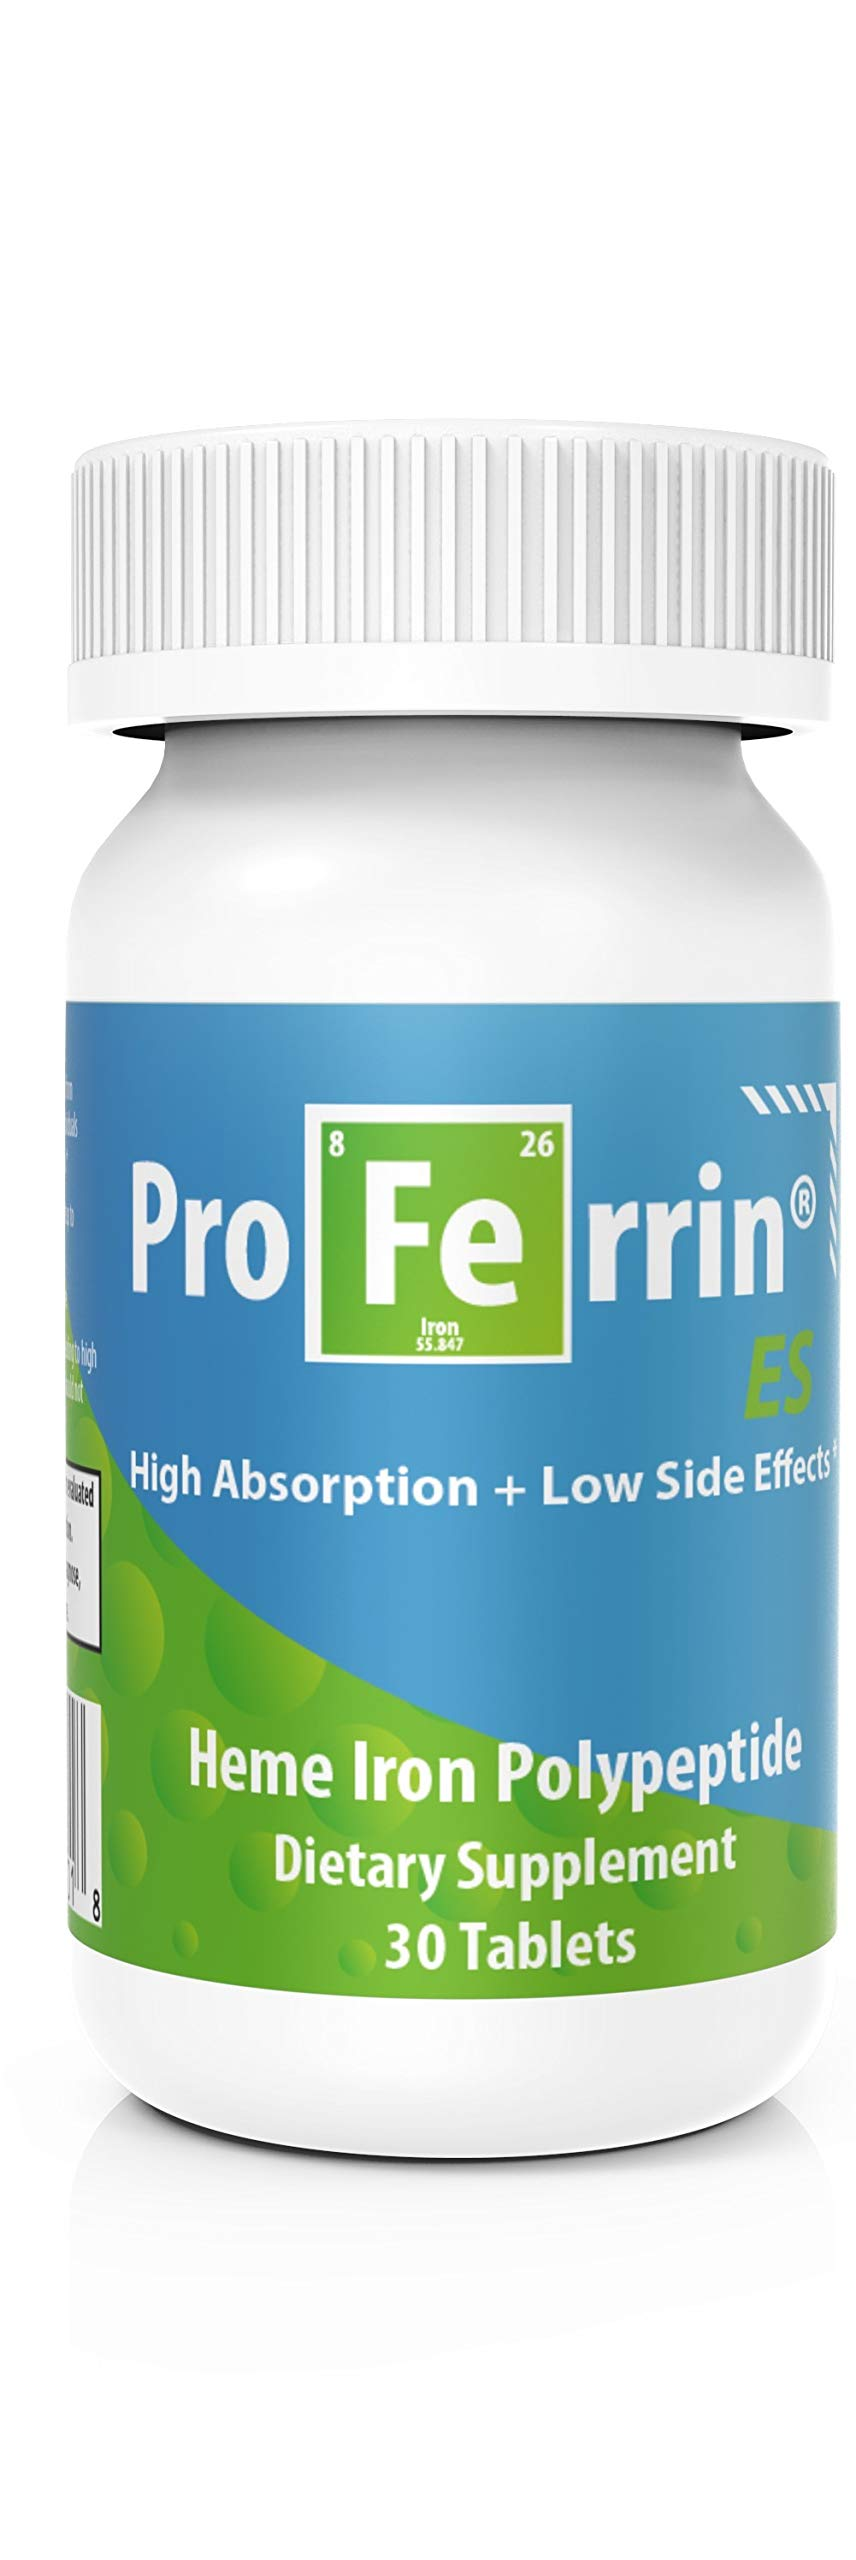 Proferrin ES Heme Iron Polypeptide Dietary Supplement, 30 Count